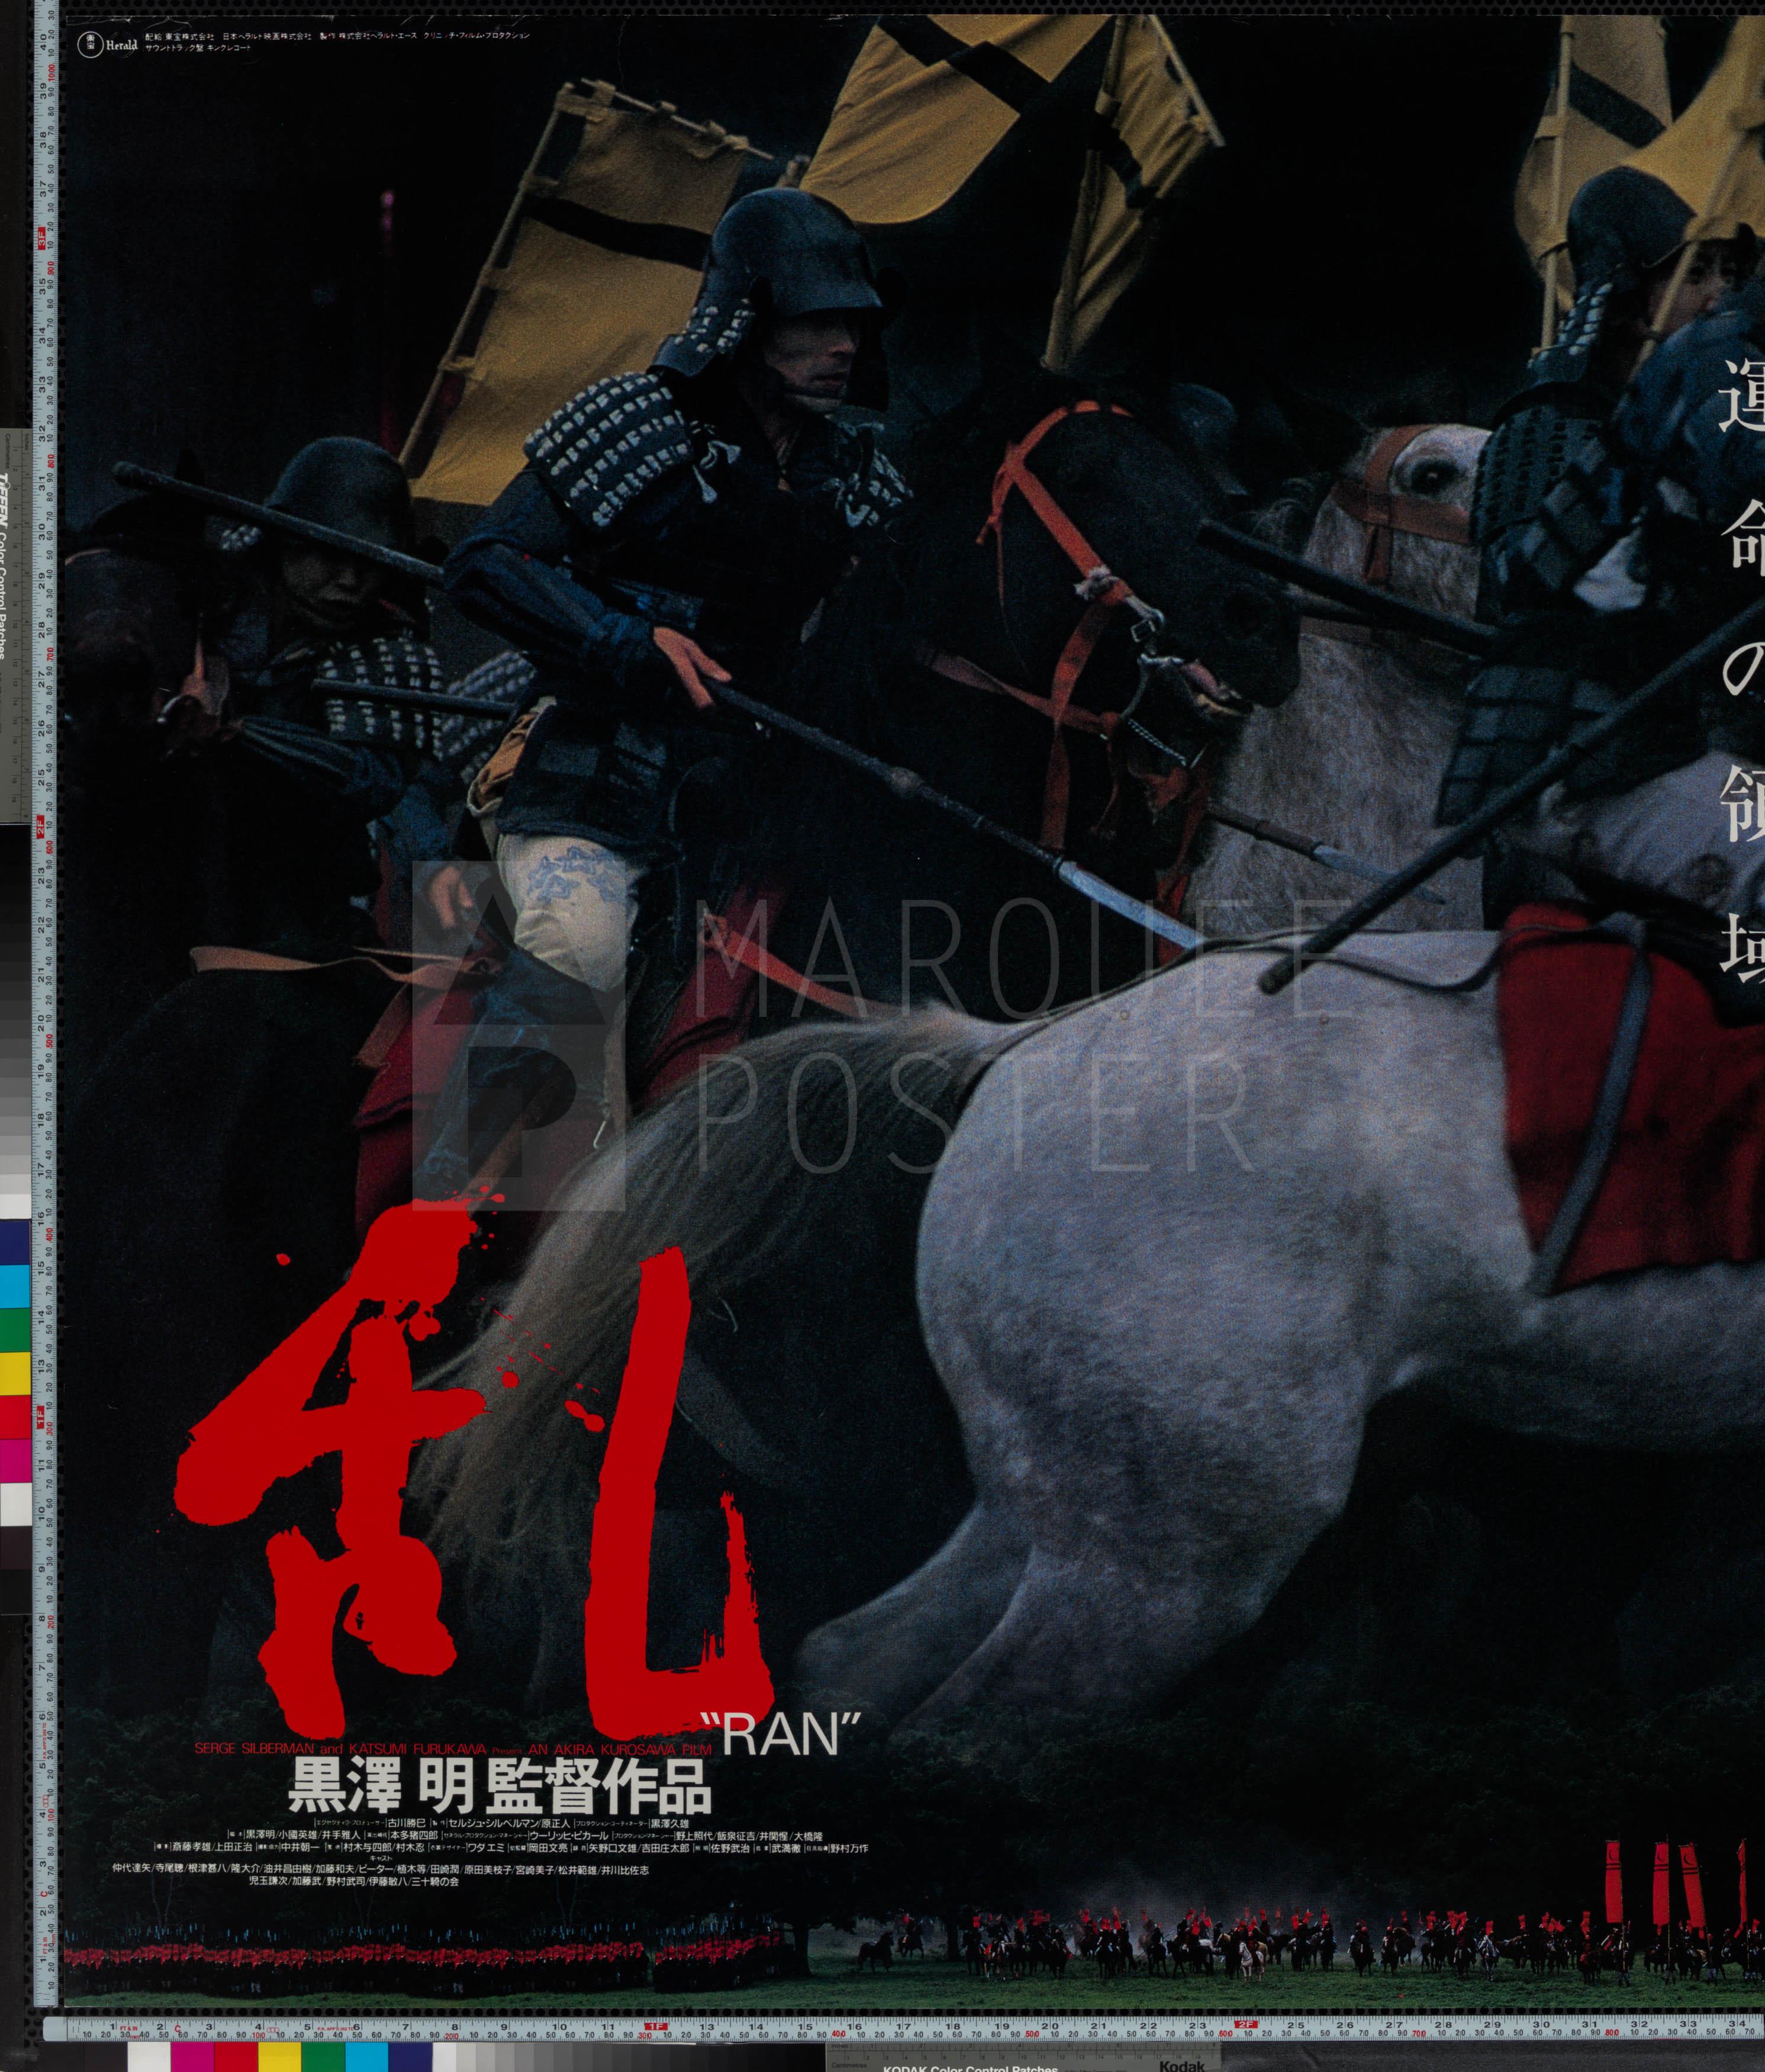 11-ran-white-horse-style-japanese-b0-1985-02